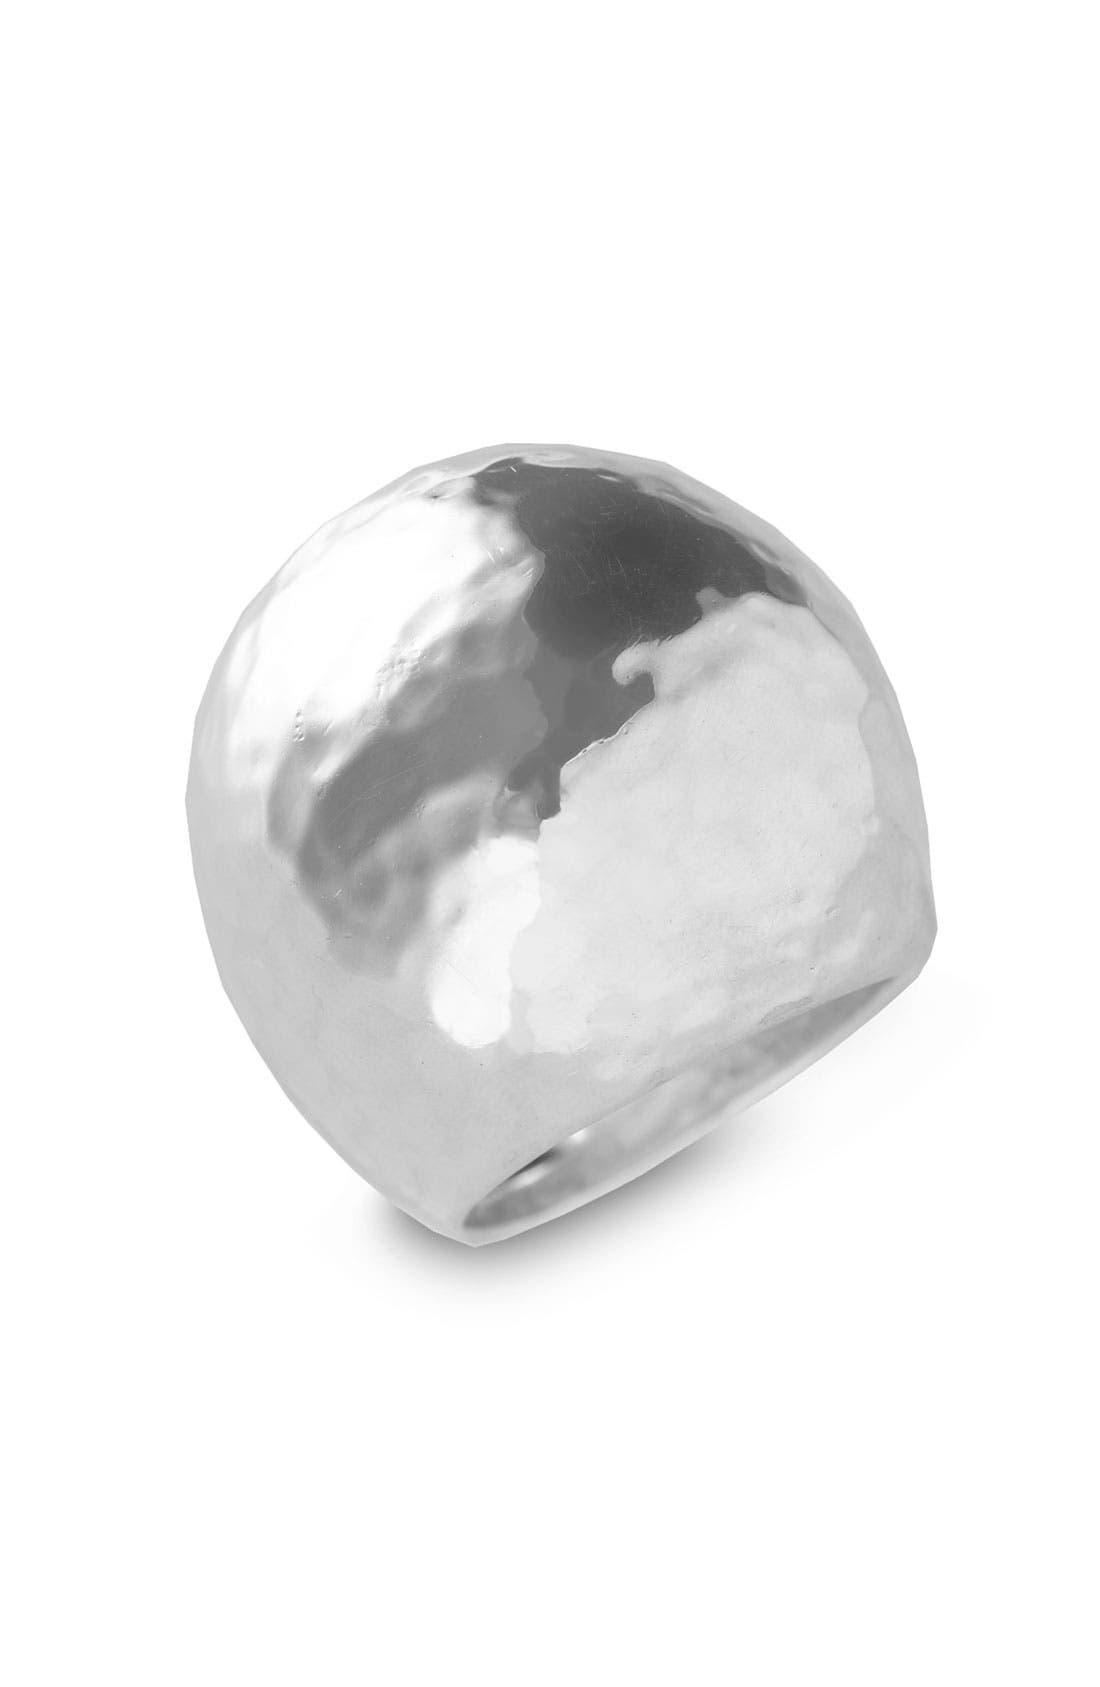 'Glamazon' Large Hammered Dome Ring,                             Main thumbnail 1, color,                             049